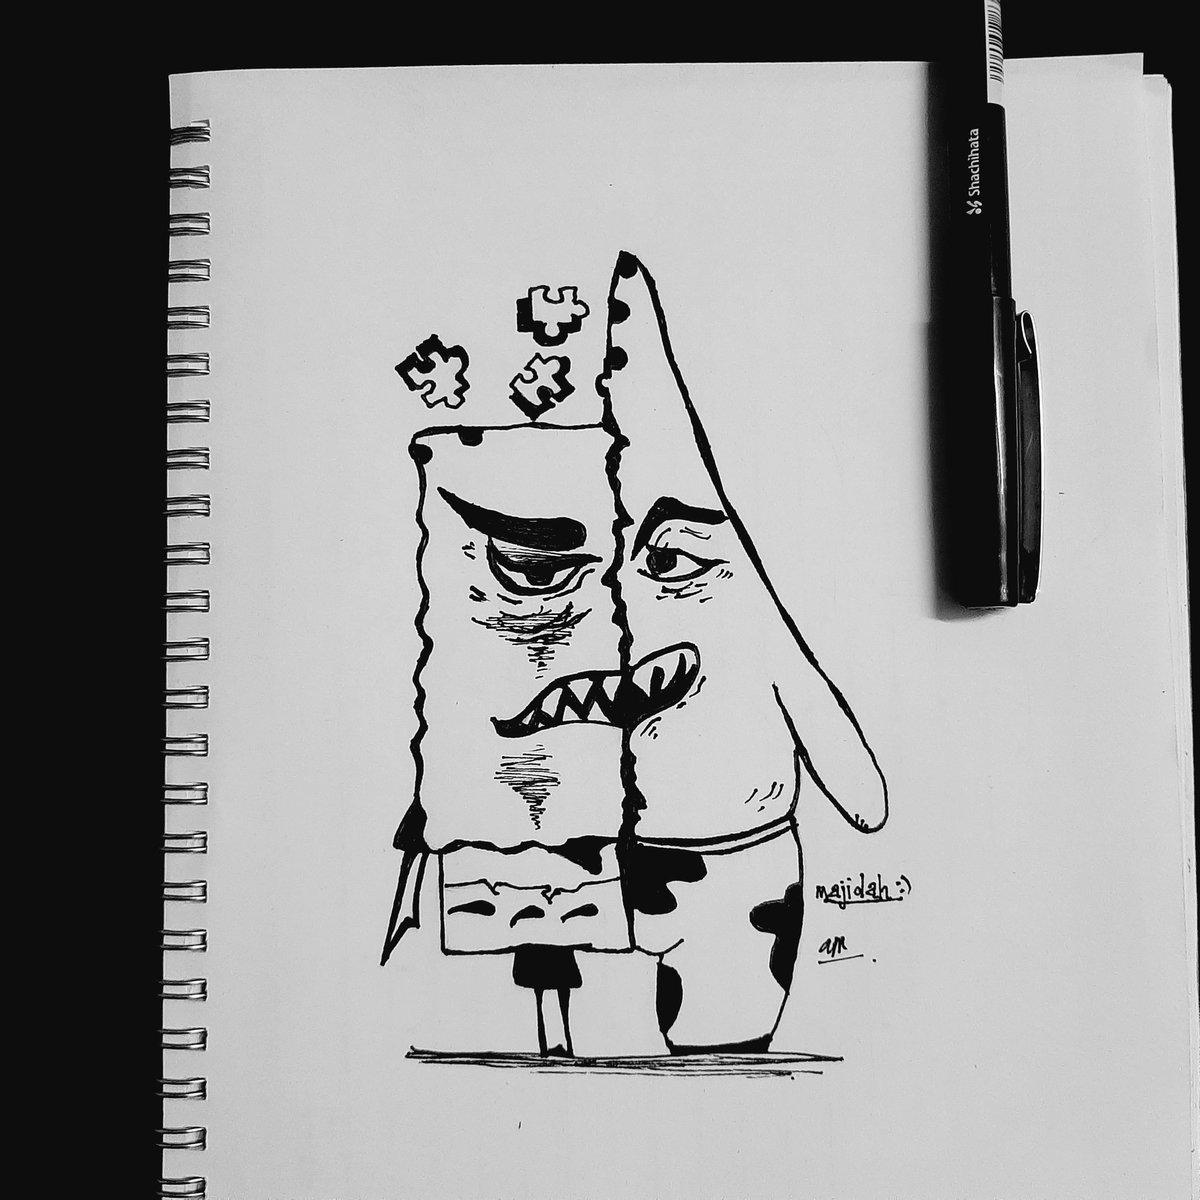 Spongebob ft patrick.  #sketchforfun<br>http://pic.twitter.com/Gn0KbZl3AM